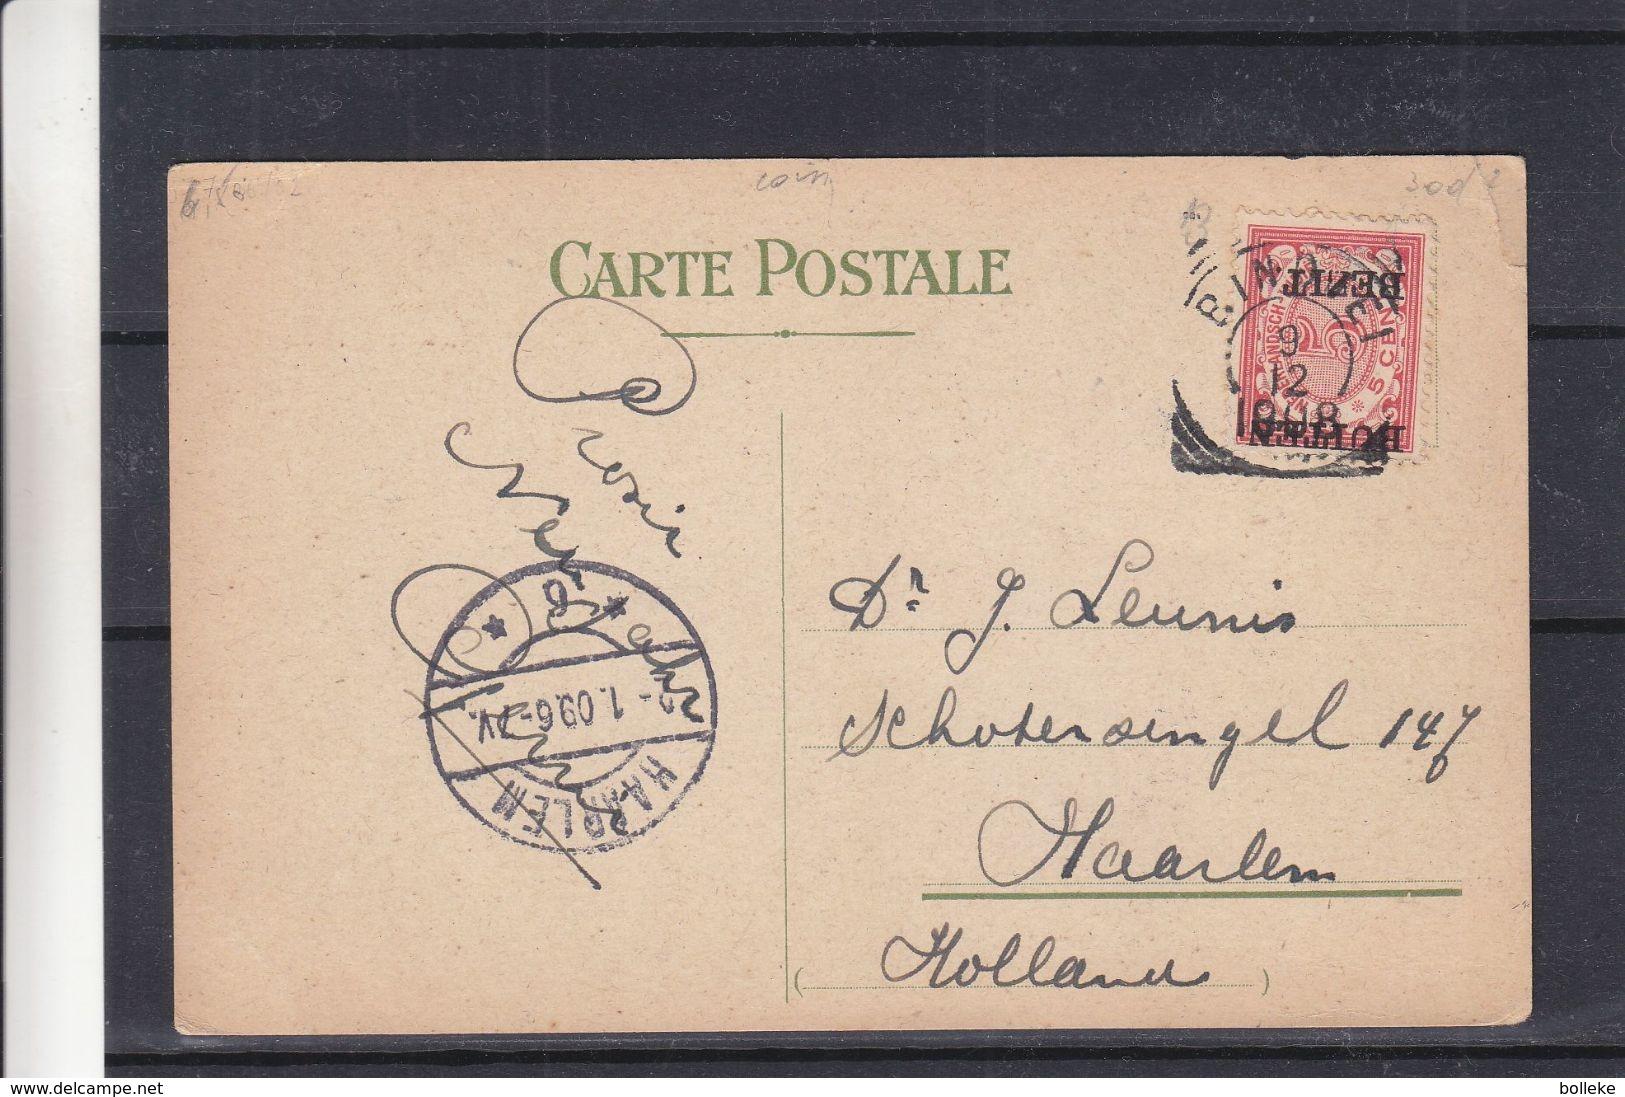 Indes Néerlandaises - Carte Postale De 1908 - Oblit Bindjei  ? - Exp Vers Haarlem Au Pays Bas - Nederlands-Indië